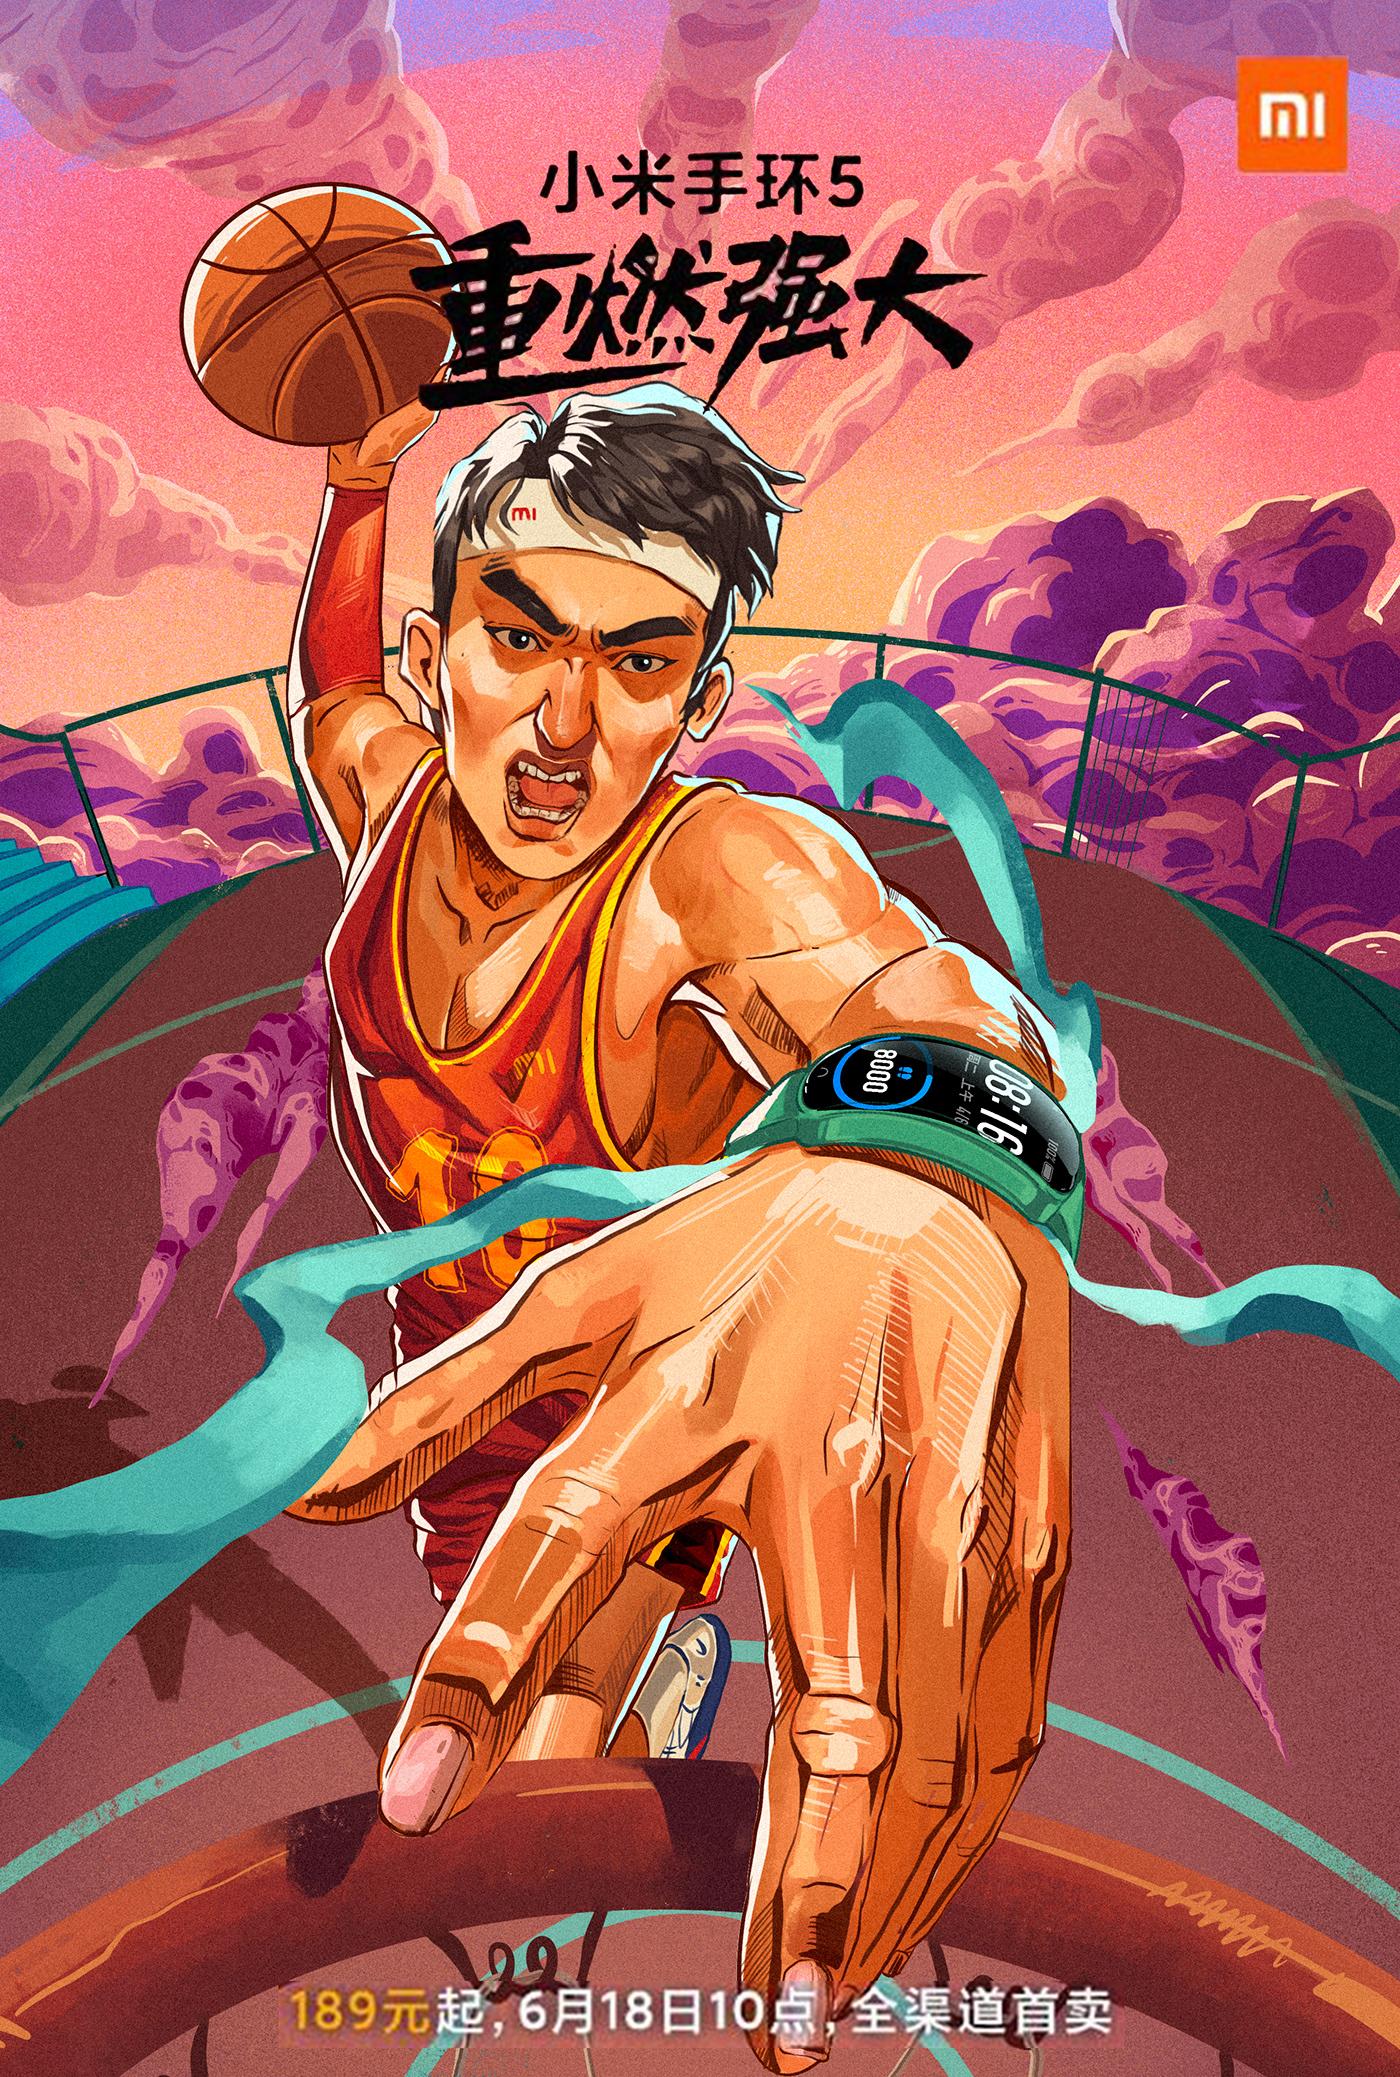 basketball Boxing bracelet Character design  giate Perspective sneaker Street Art  swimming xiaomi band